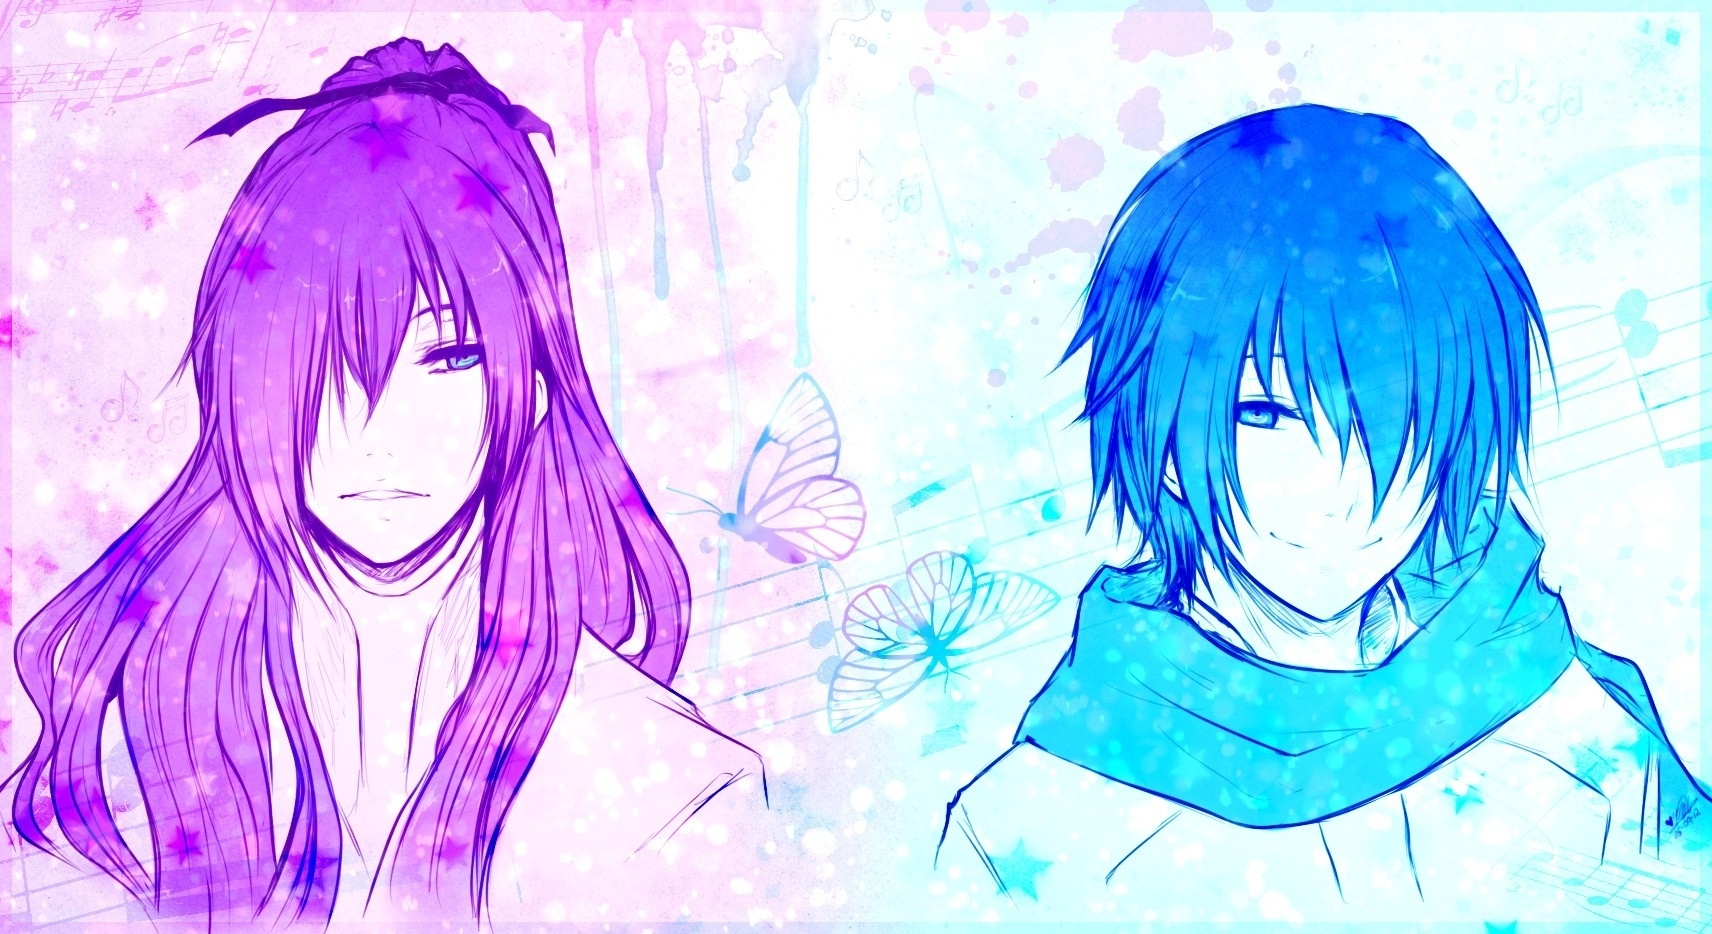 anime boys kamui gakupo 1712x934 wallpaper High Resolution Wallpaper 1712x934